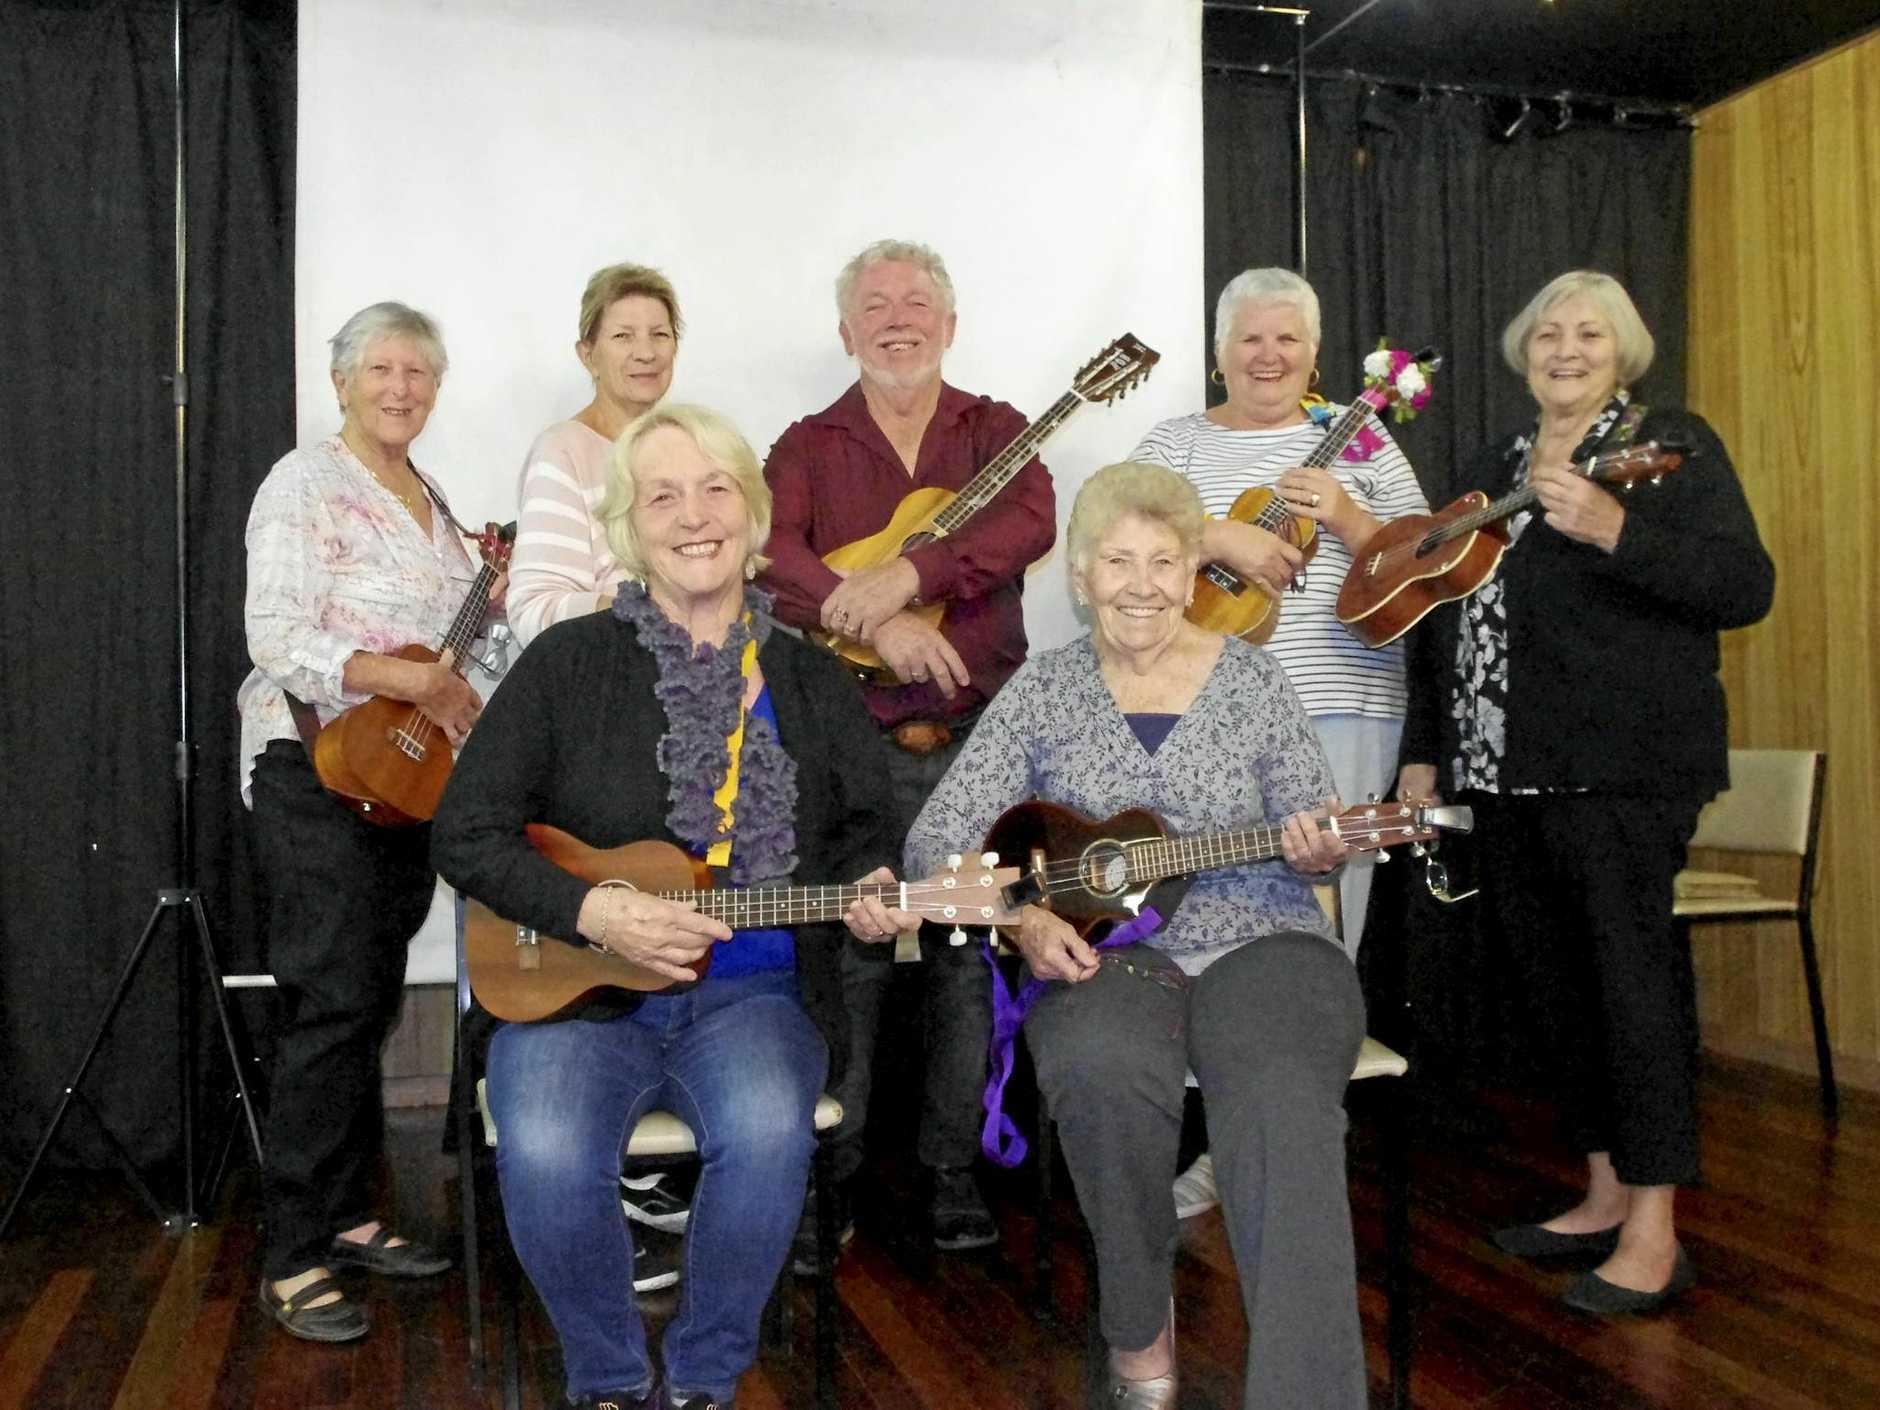 GRAB YOUR UKE: Gladstone ukulele club meet twice each week for musical fun.